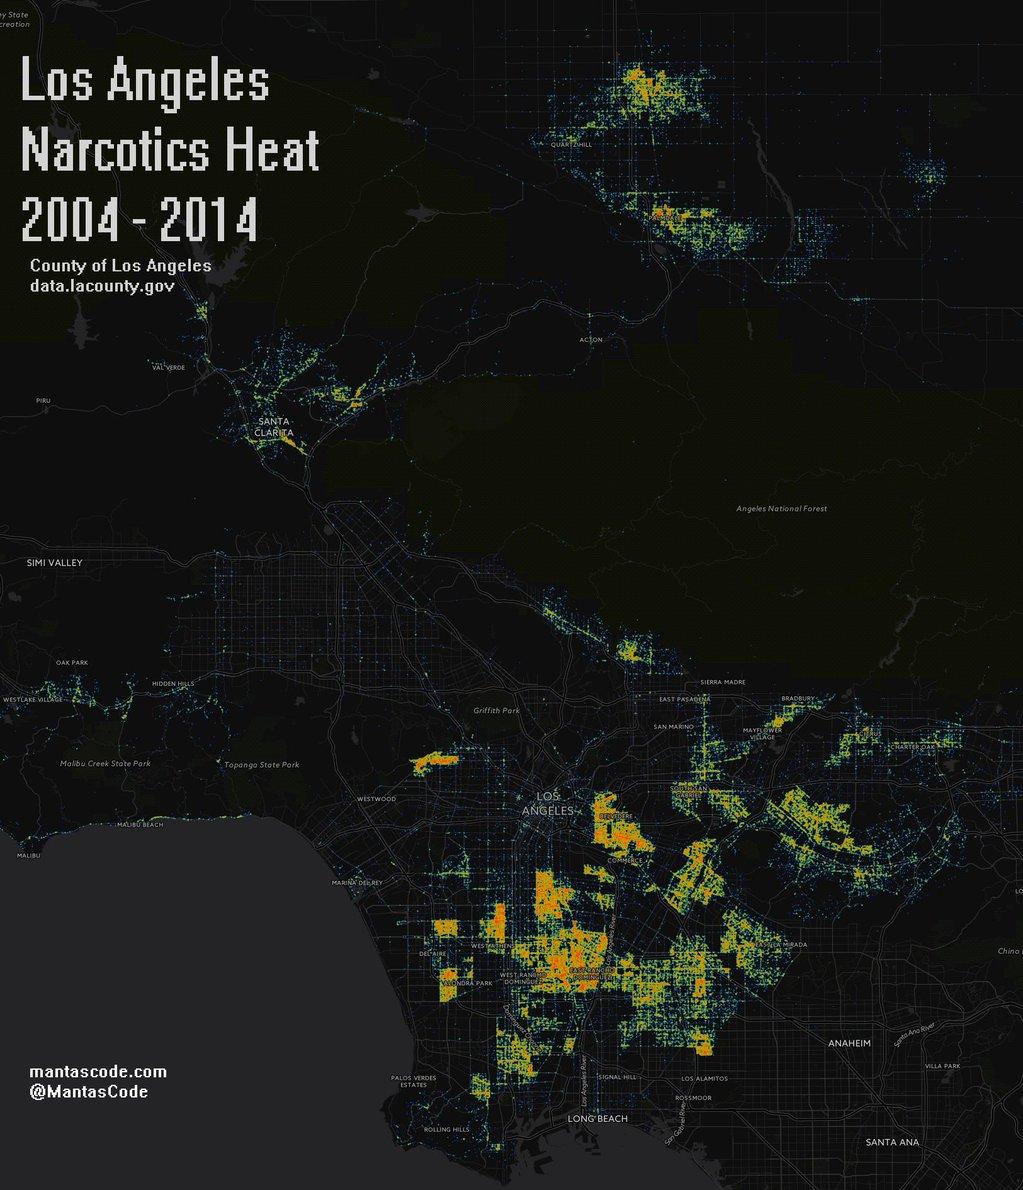 Los Angeles narcotics heat (2004 - 2014)